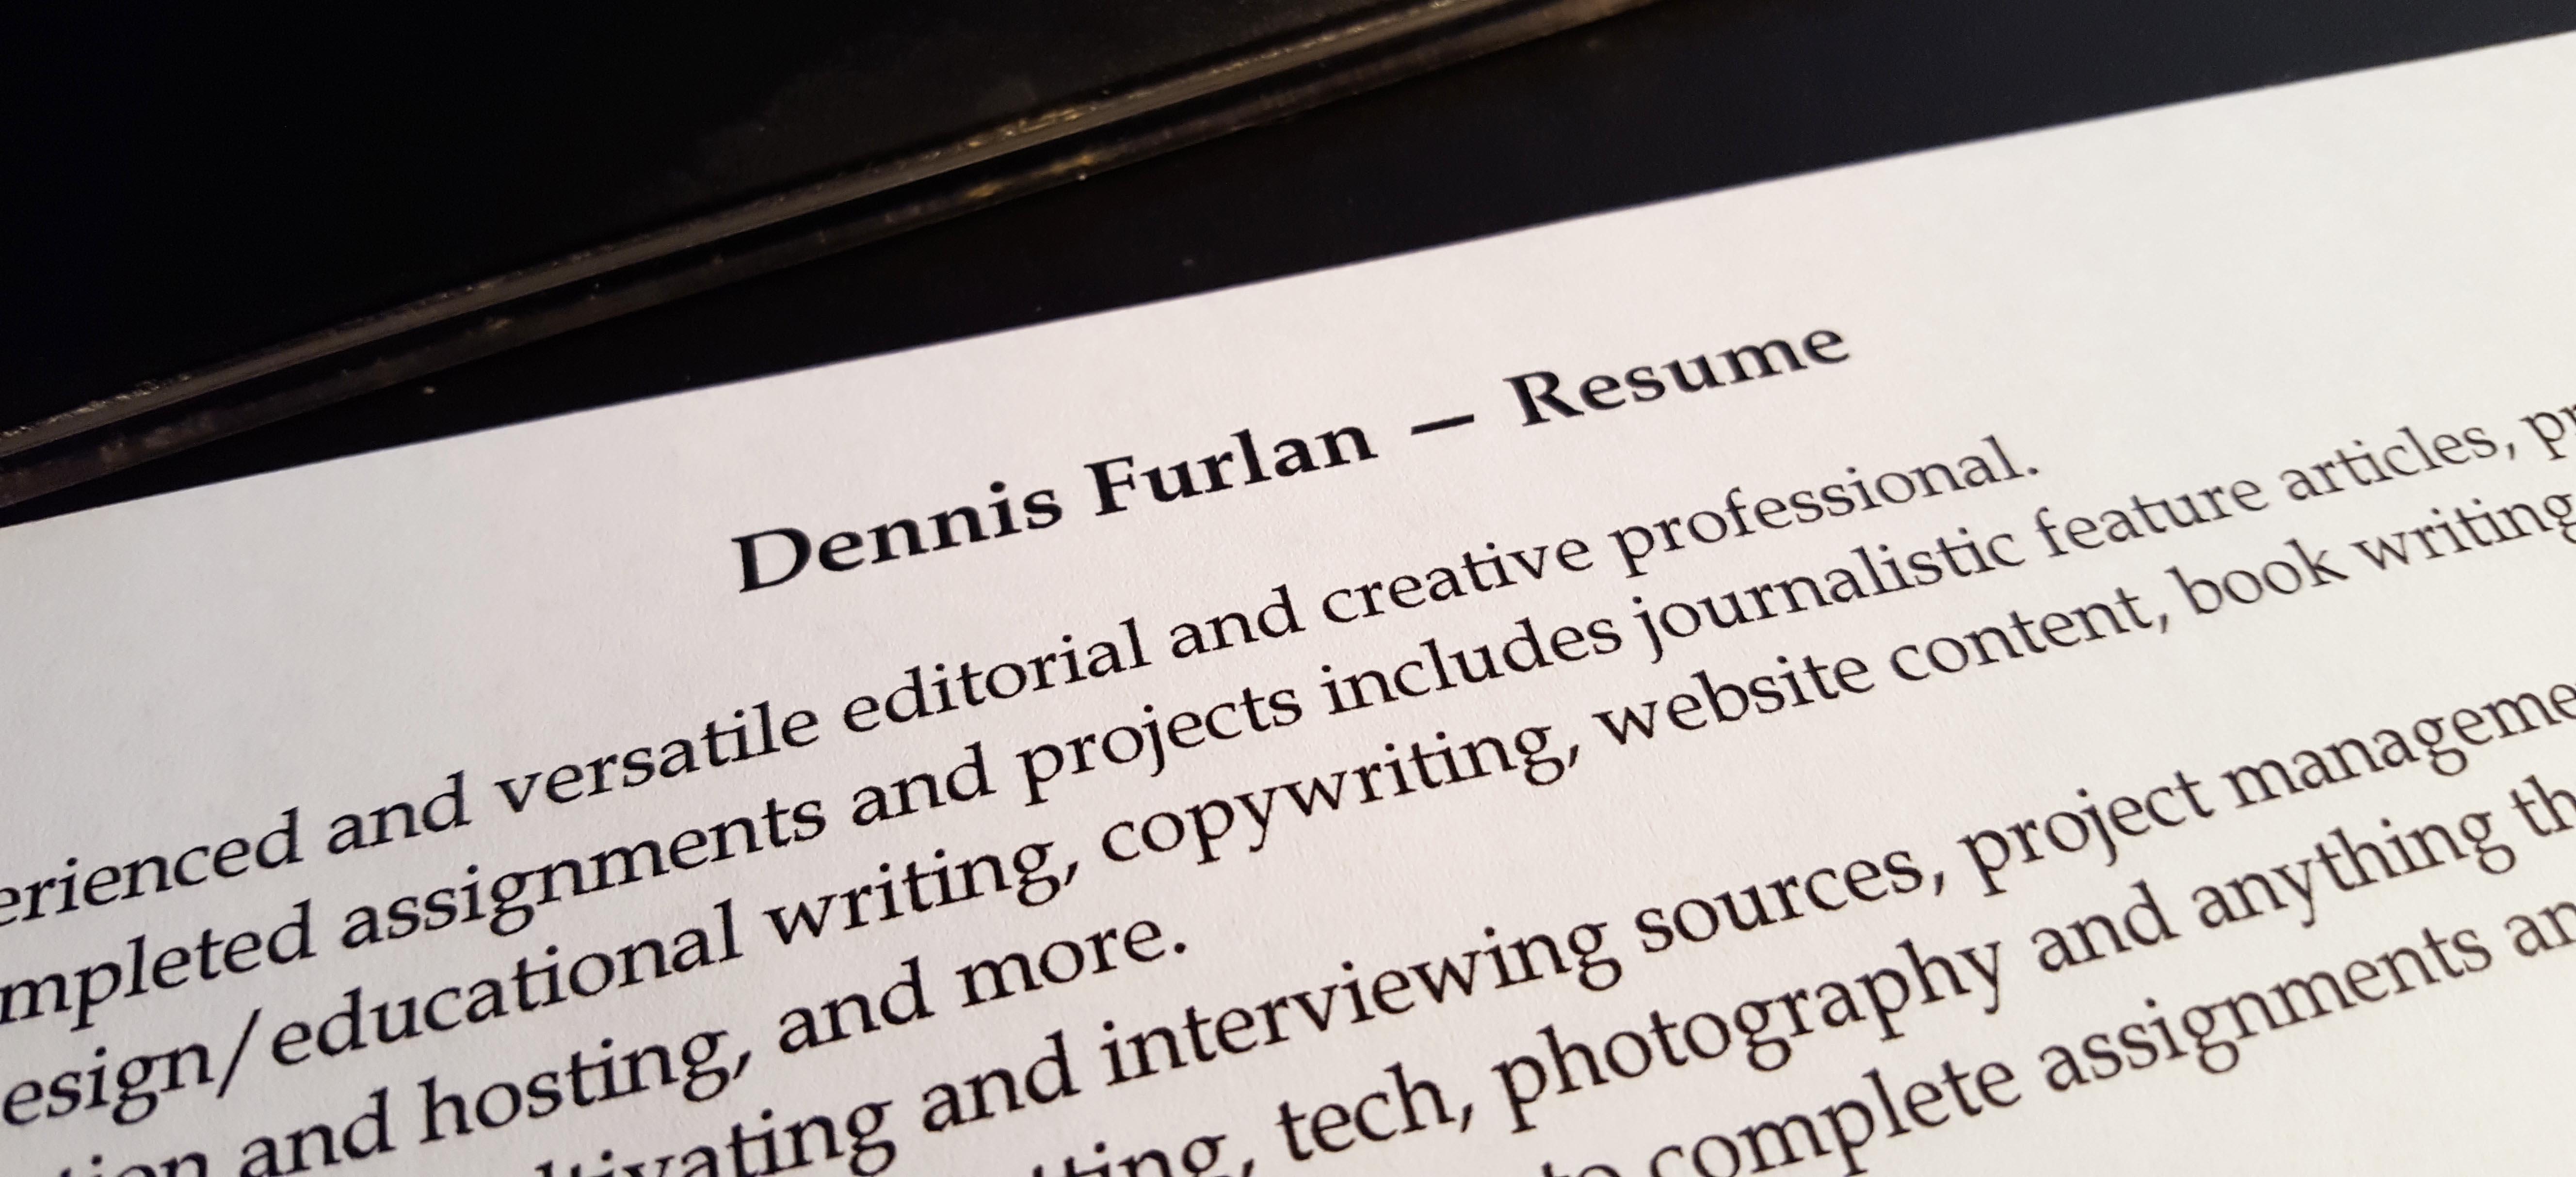 entry level objective resume network engineer resume